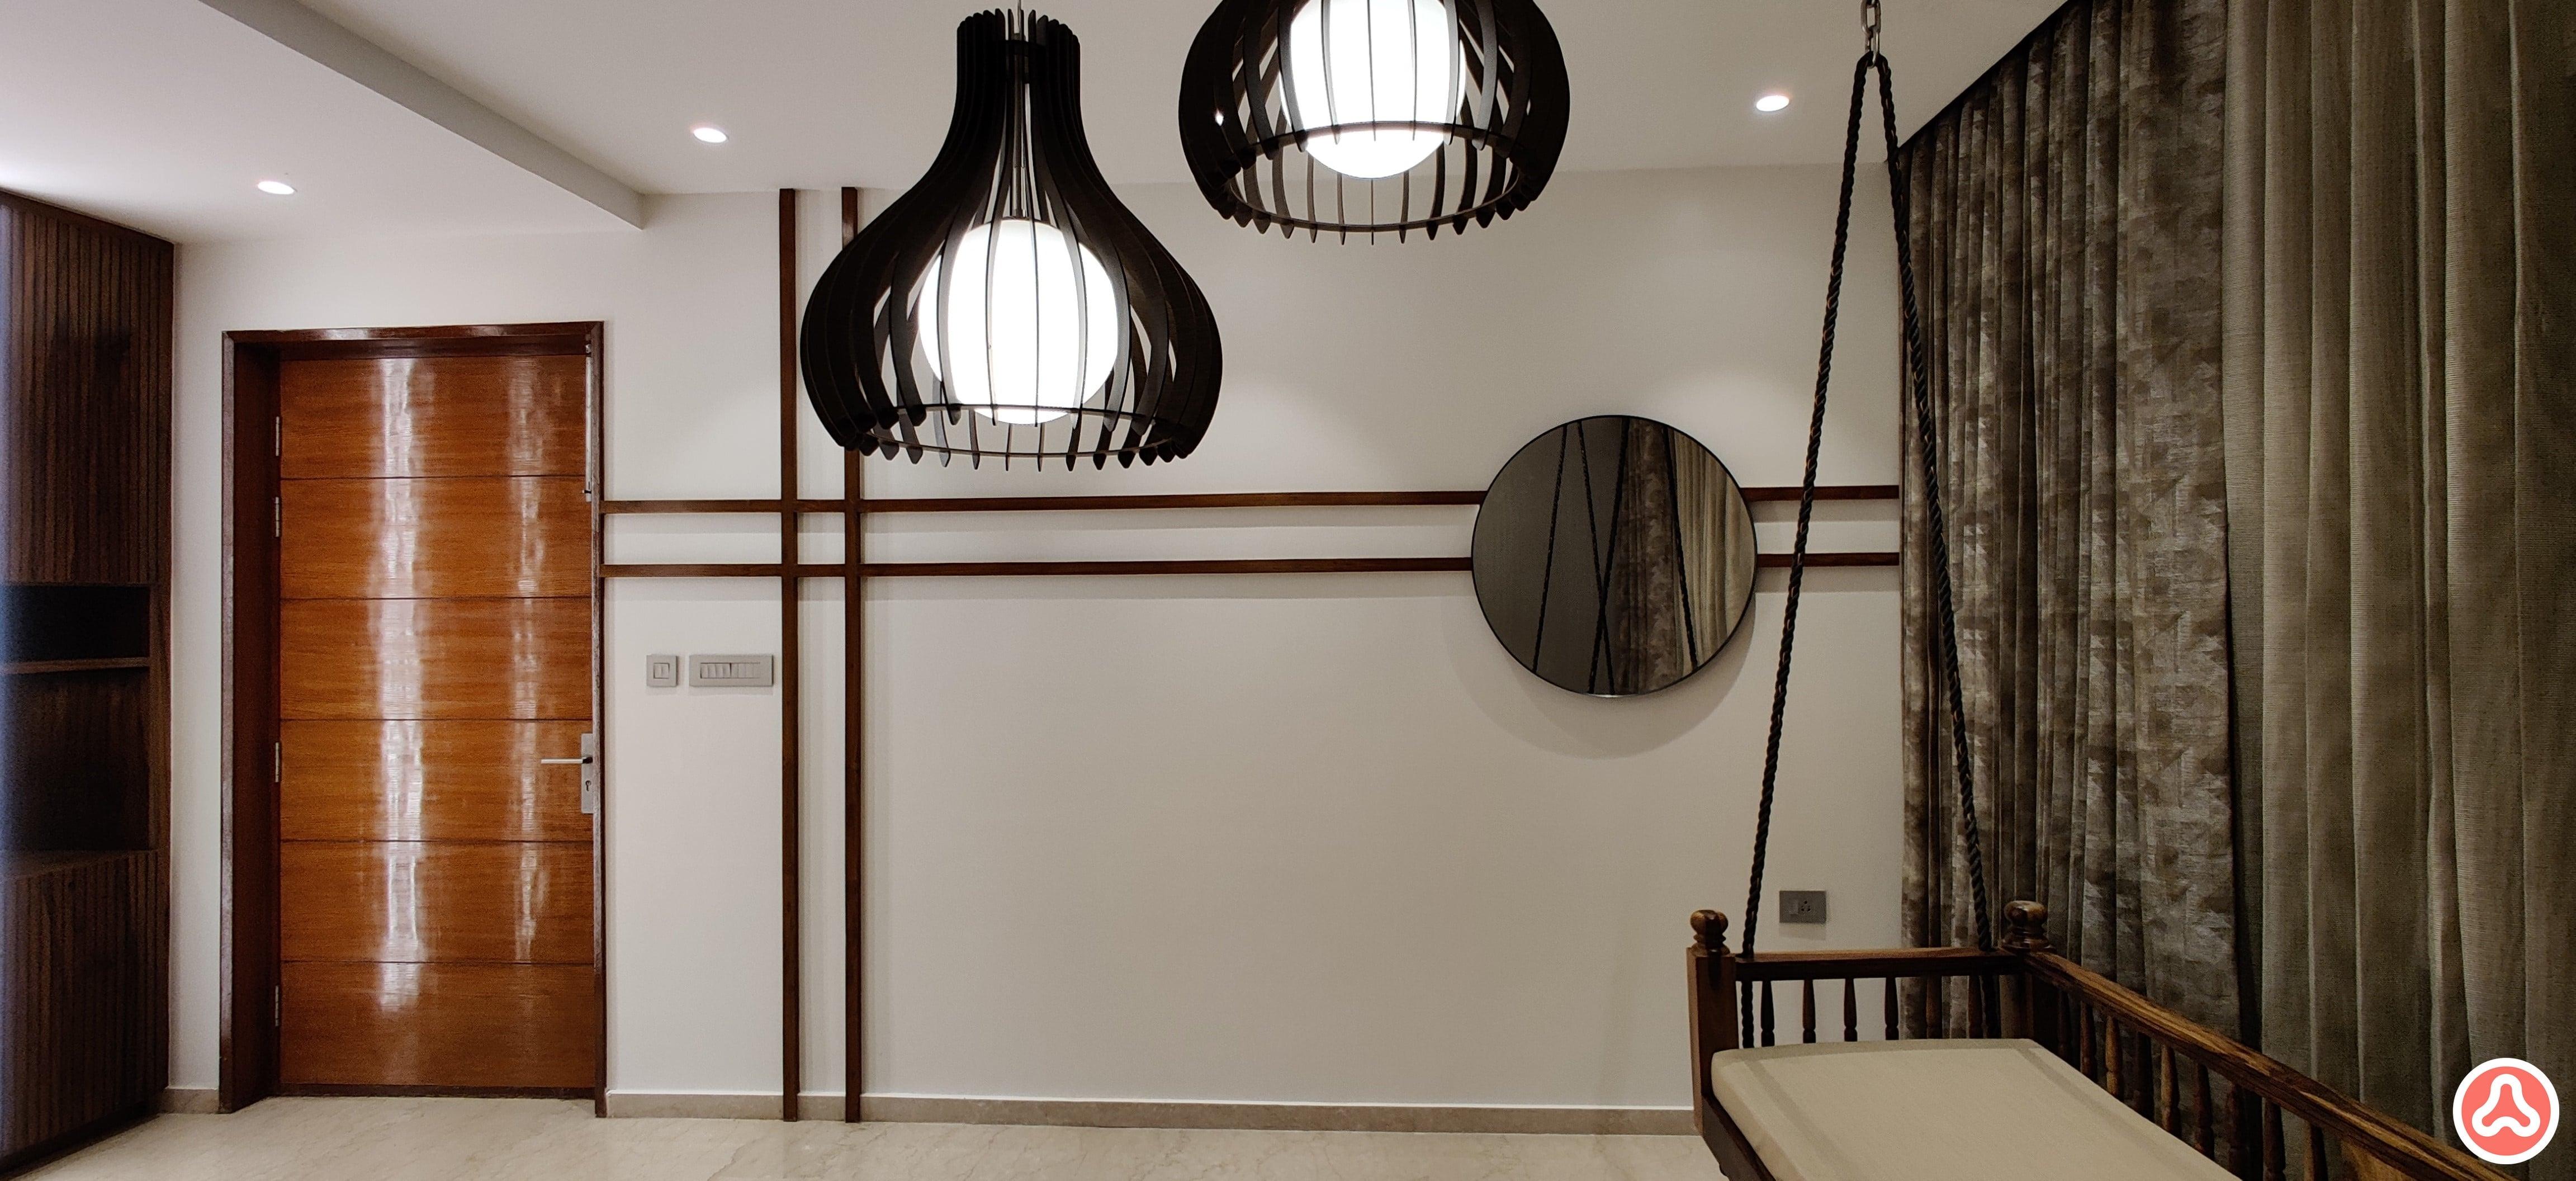 Wall beading and mirror